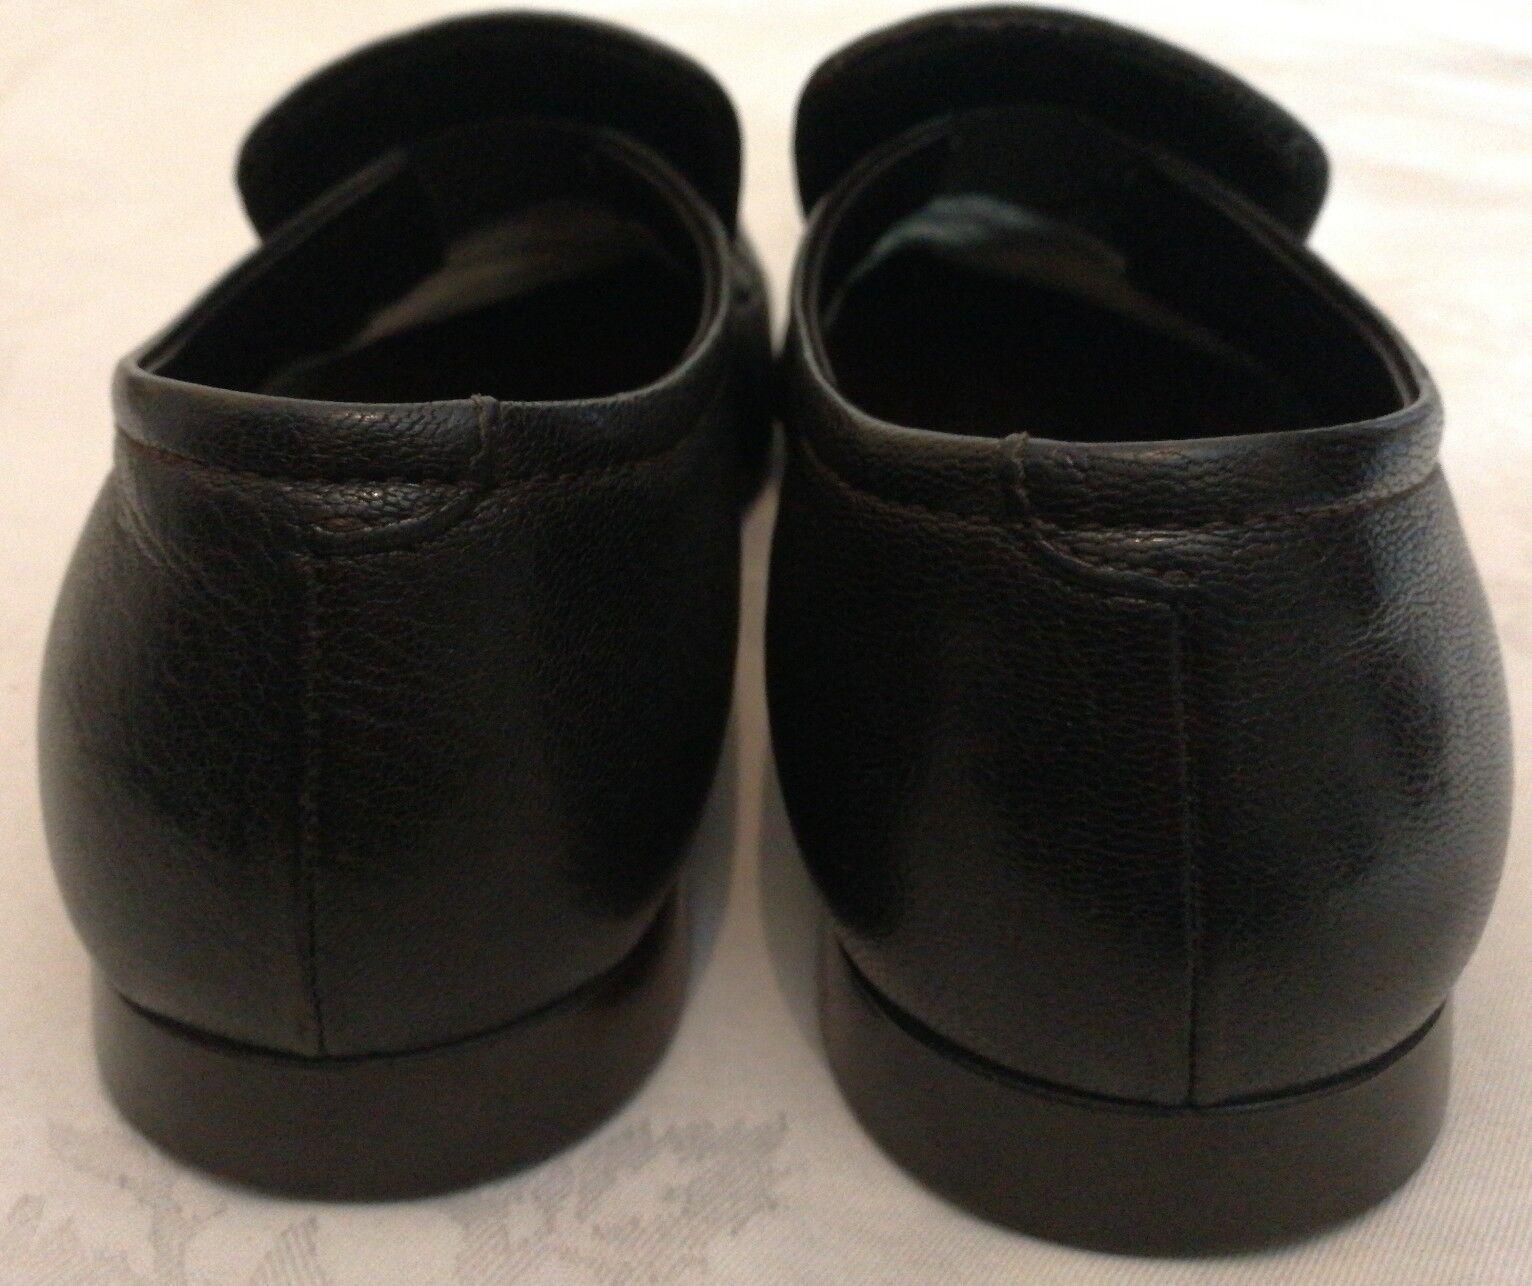 Prada 2D Loafers 1110  Herren Leder Loafers 2D Slip-on Schuhes Chocolate Größe uk 6 eu 40 e33c35